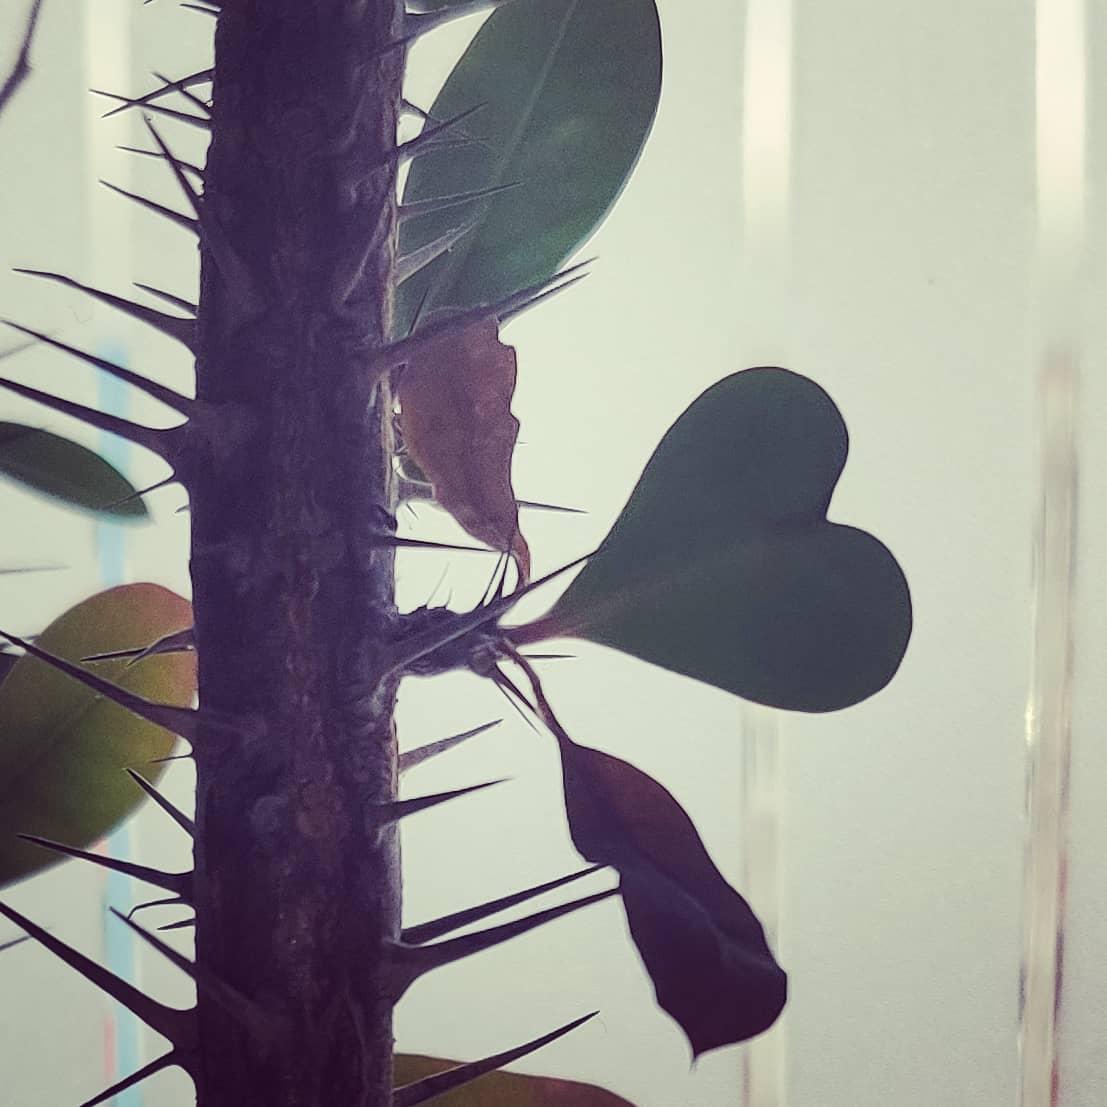 #instagram: Der Christusdorn hat Frühling #loveisintheair